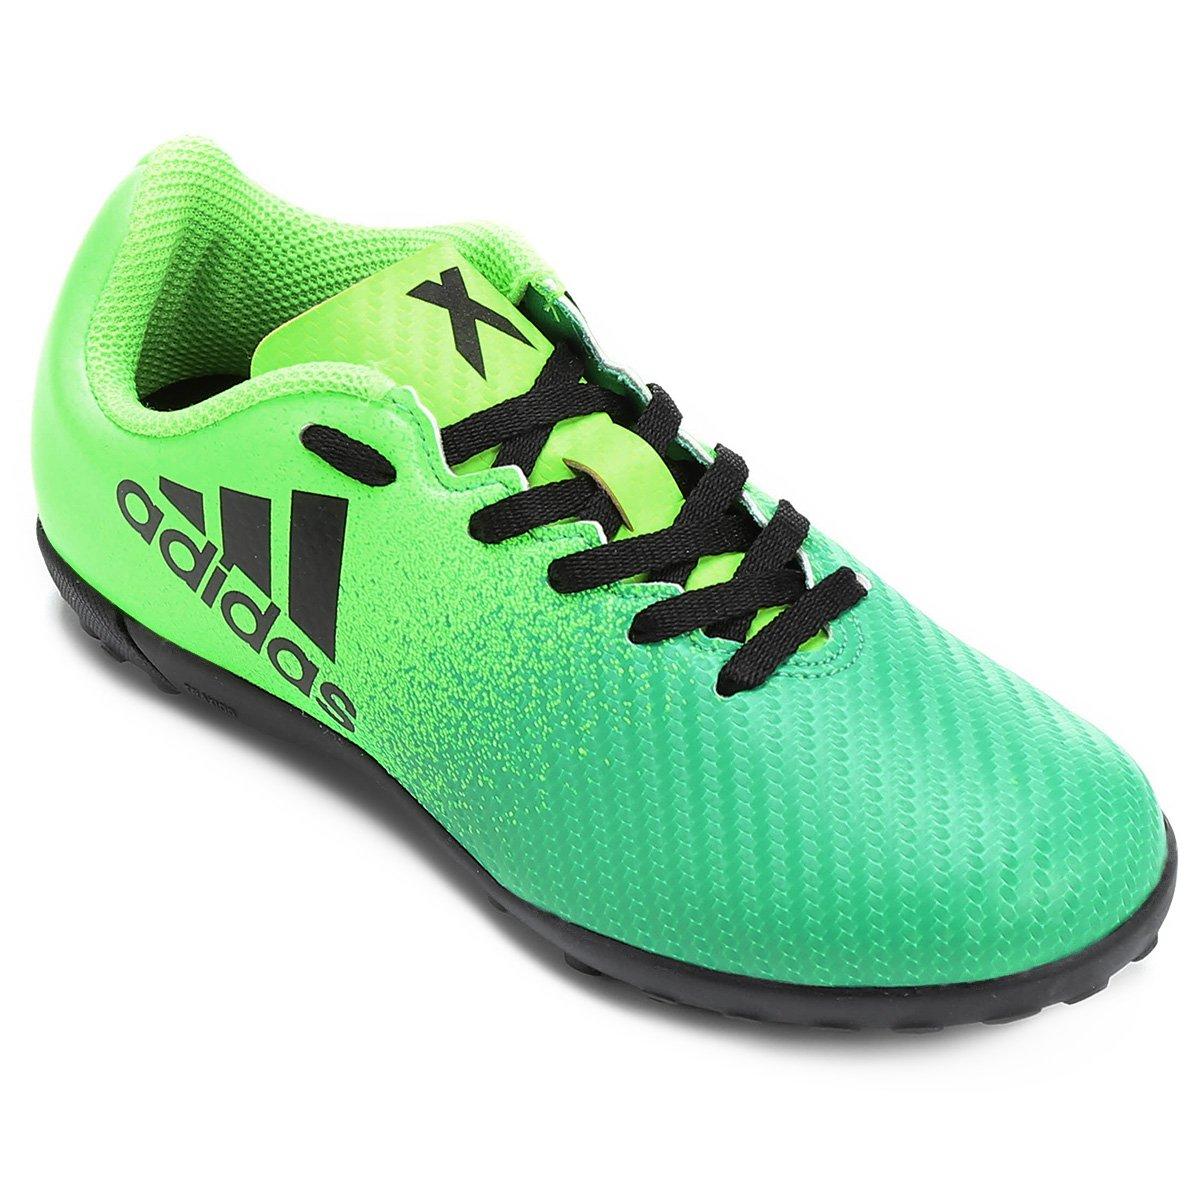 1250587501fe2 Chuteira Society Infantil Adidas X 16.4 TF - Compre Agora